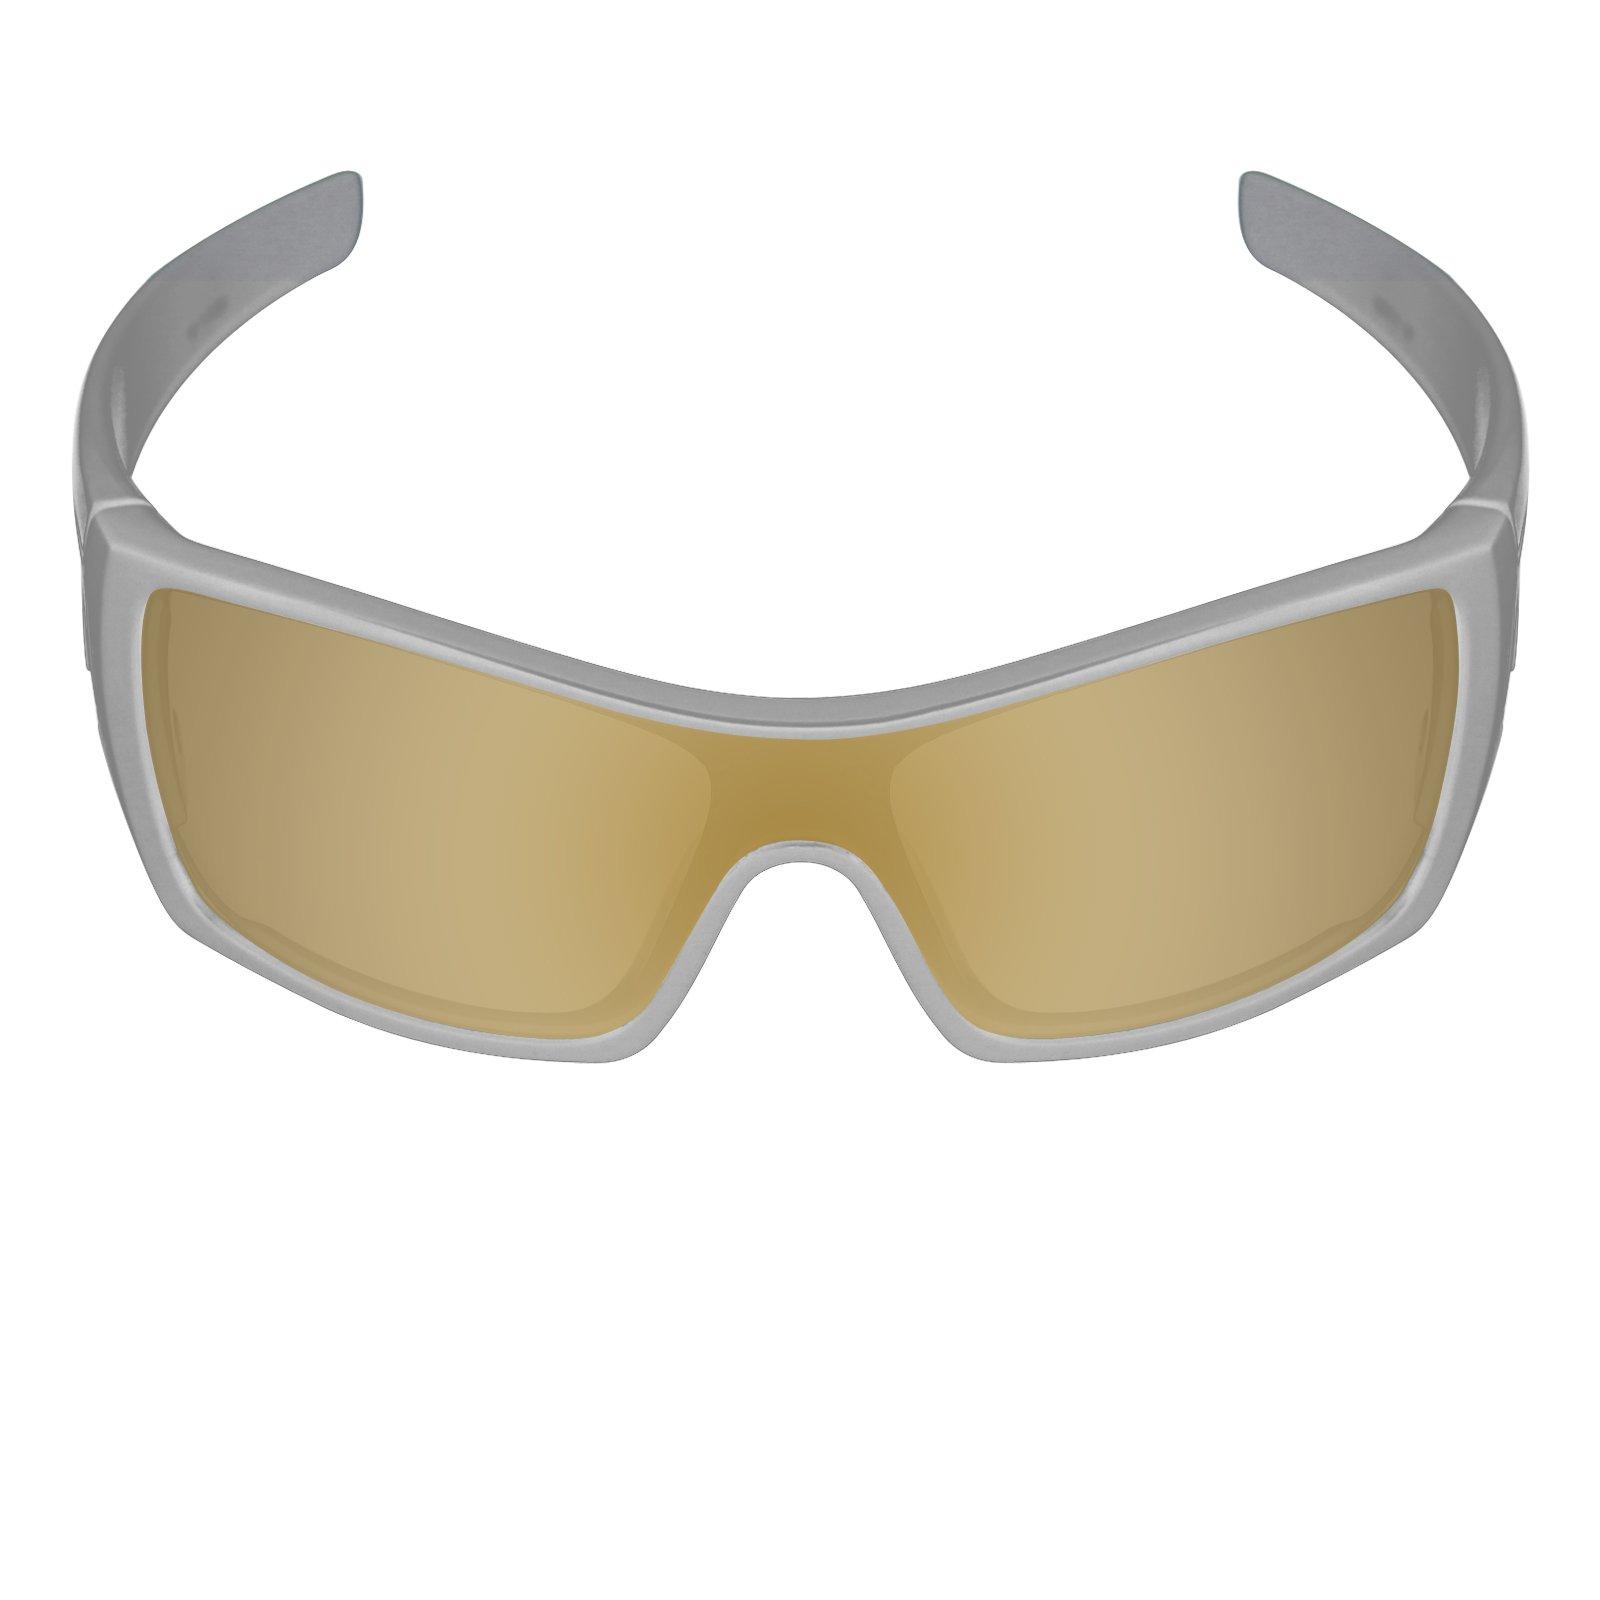 Galvanic Replacement Lenses for Oakley Batwolf Sunglasses - Tungsten  Polarized d1255e6040